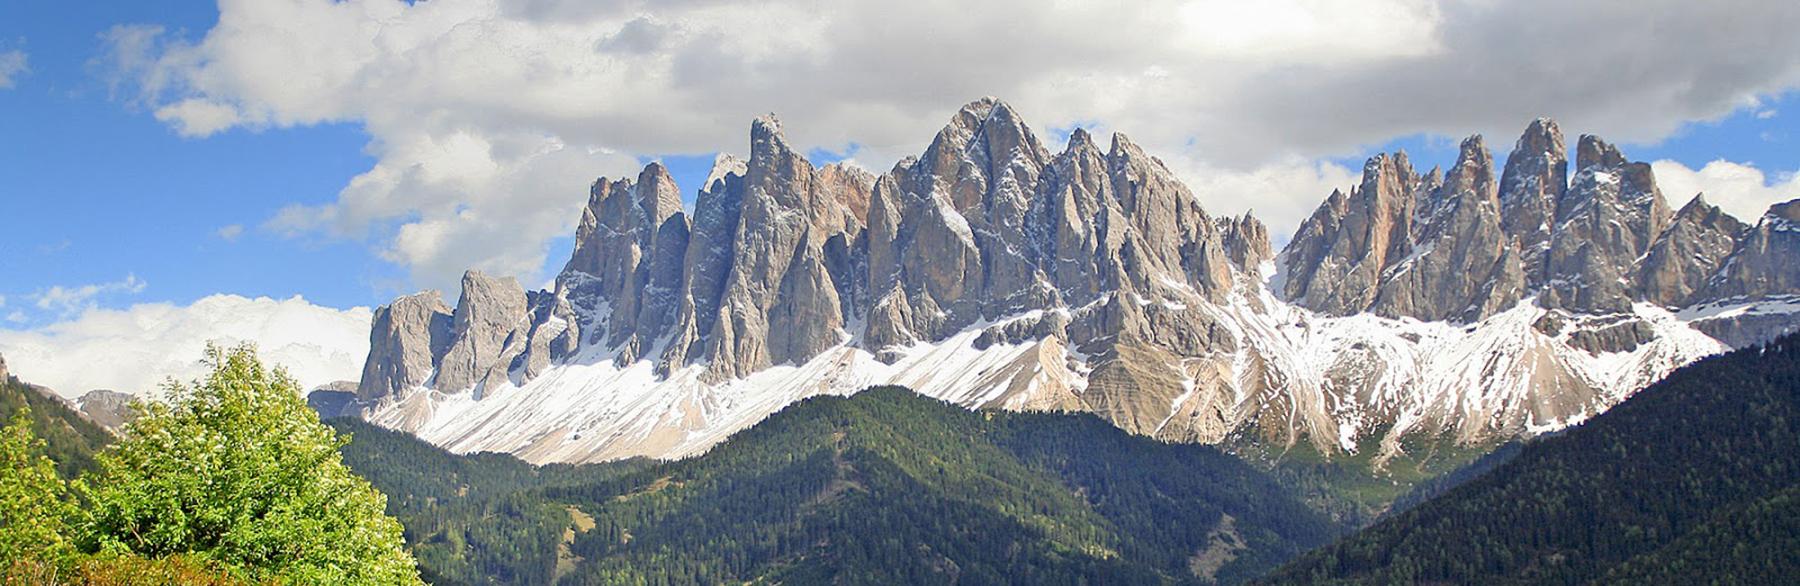 Dolomites-Italy Cropped